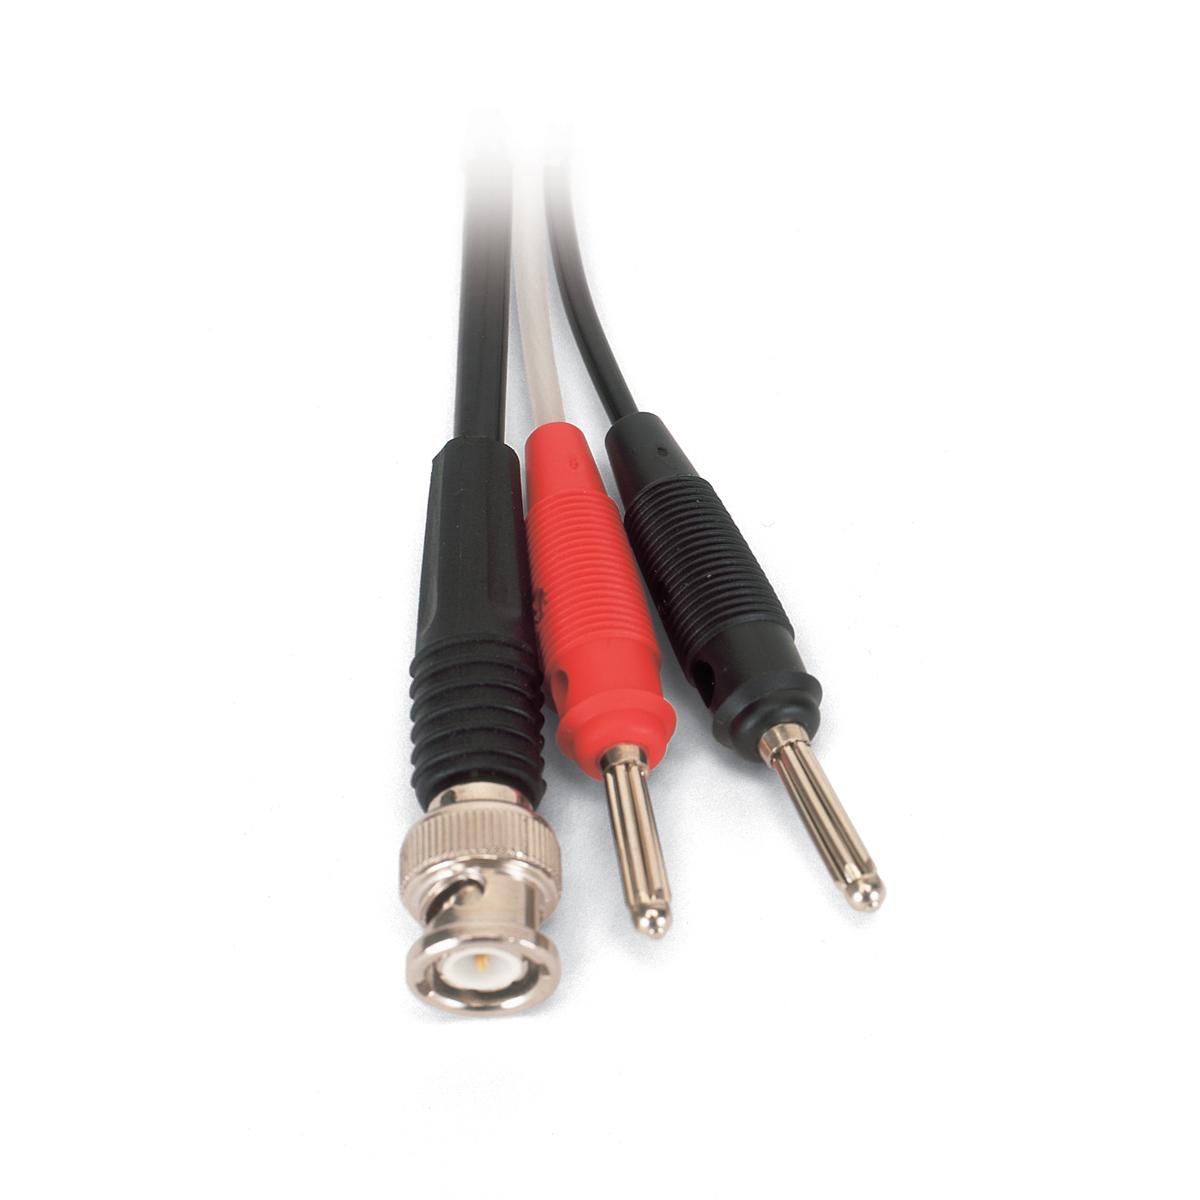 Hf Patch Cord  Bnc  4 Mm Plug - 1002748